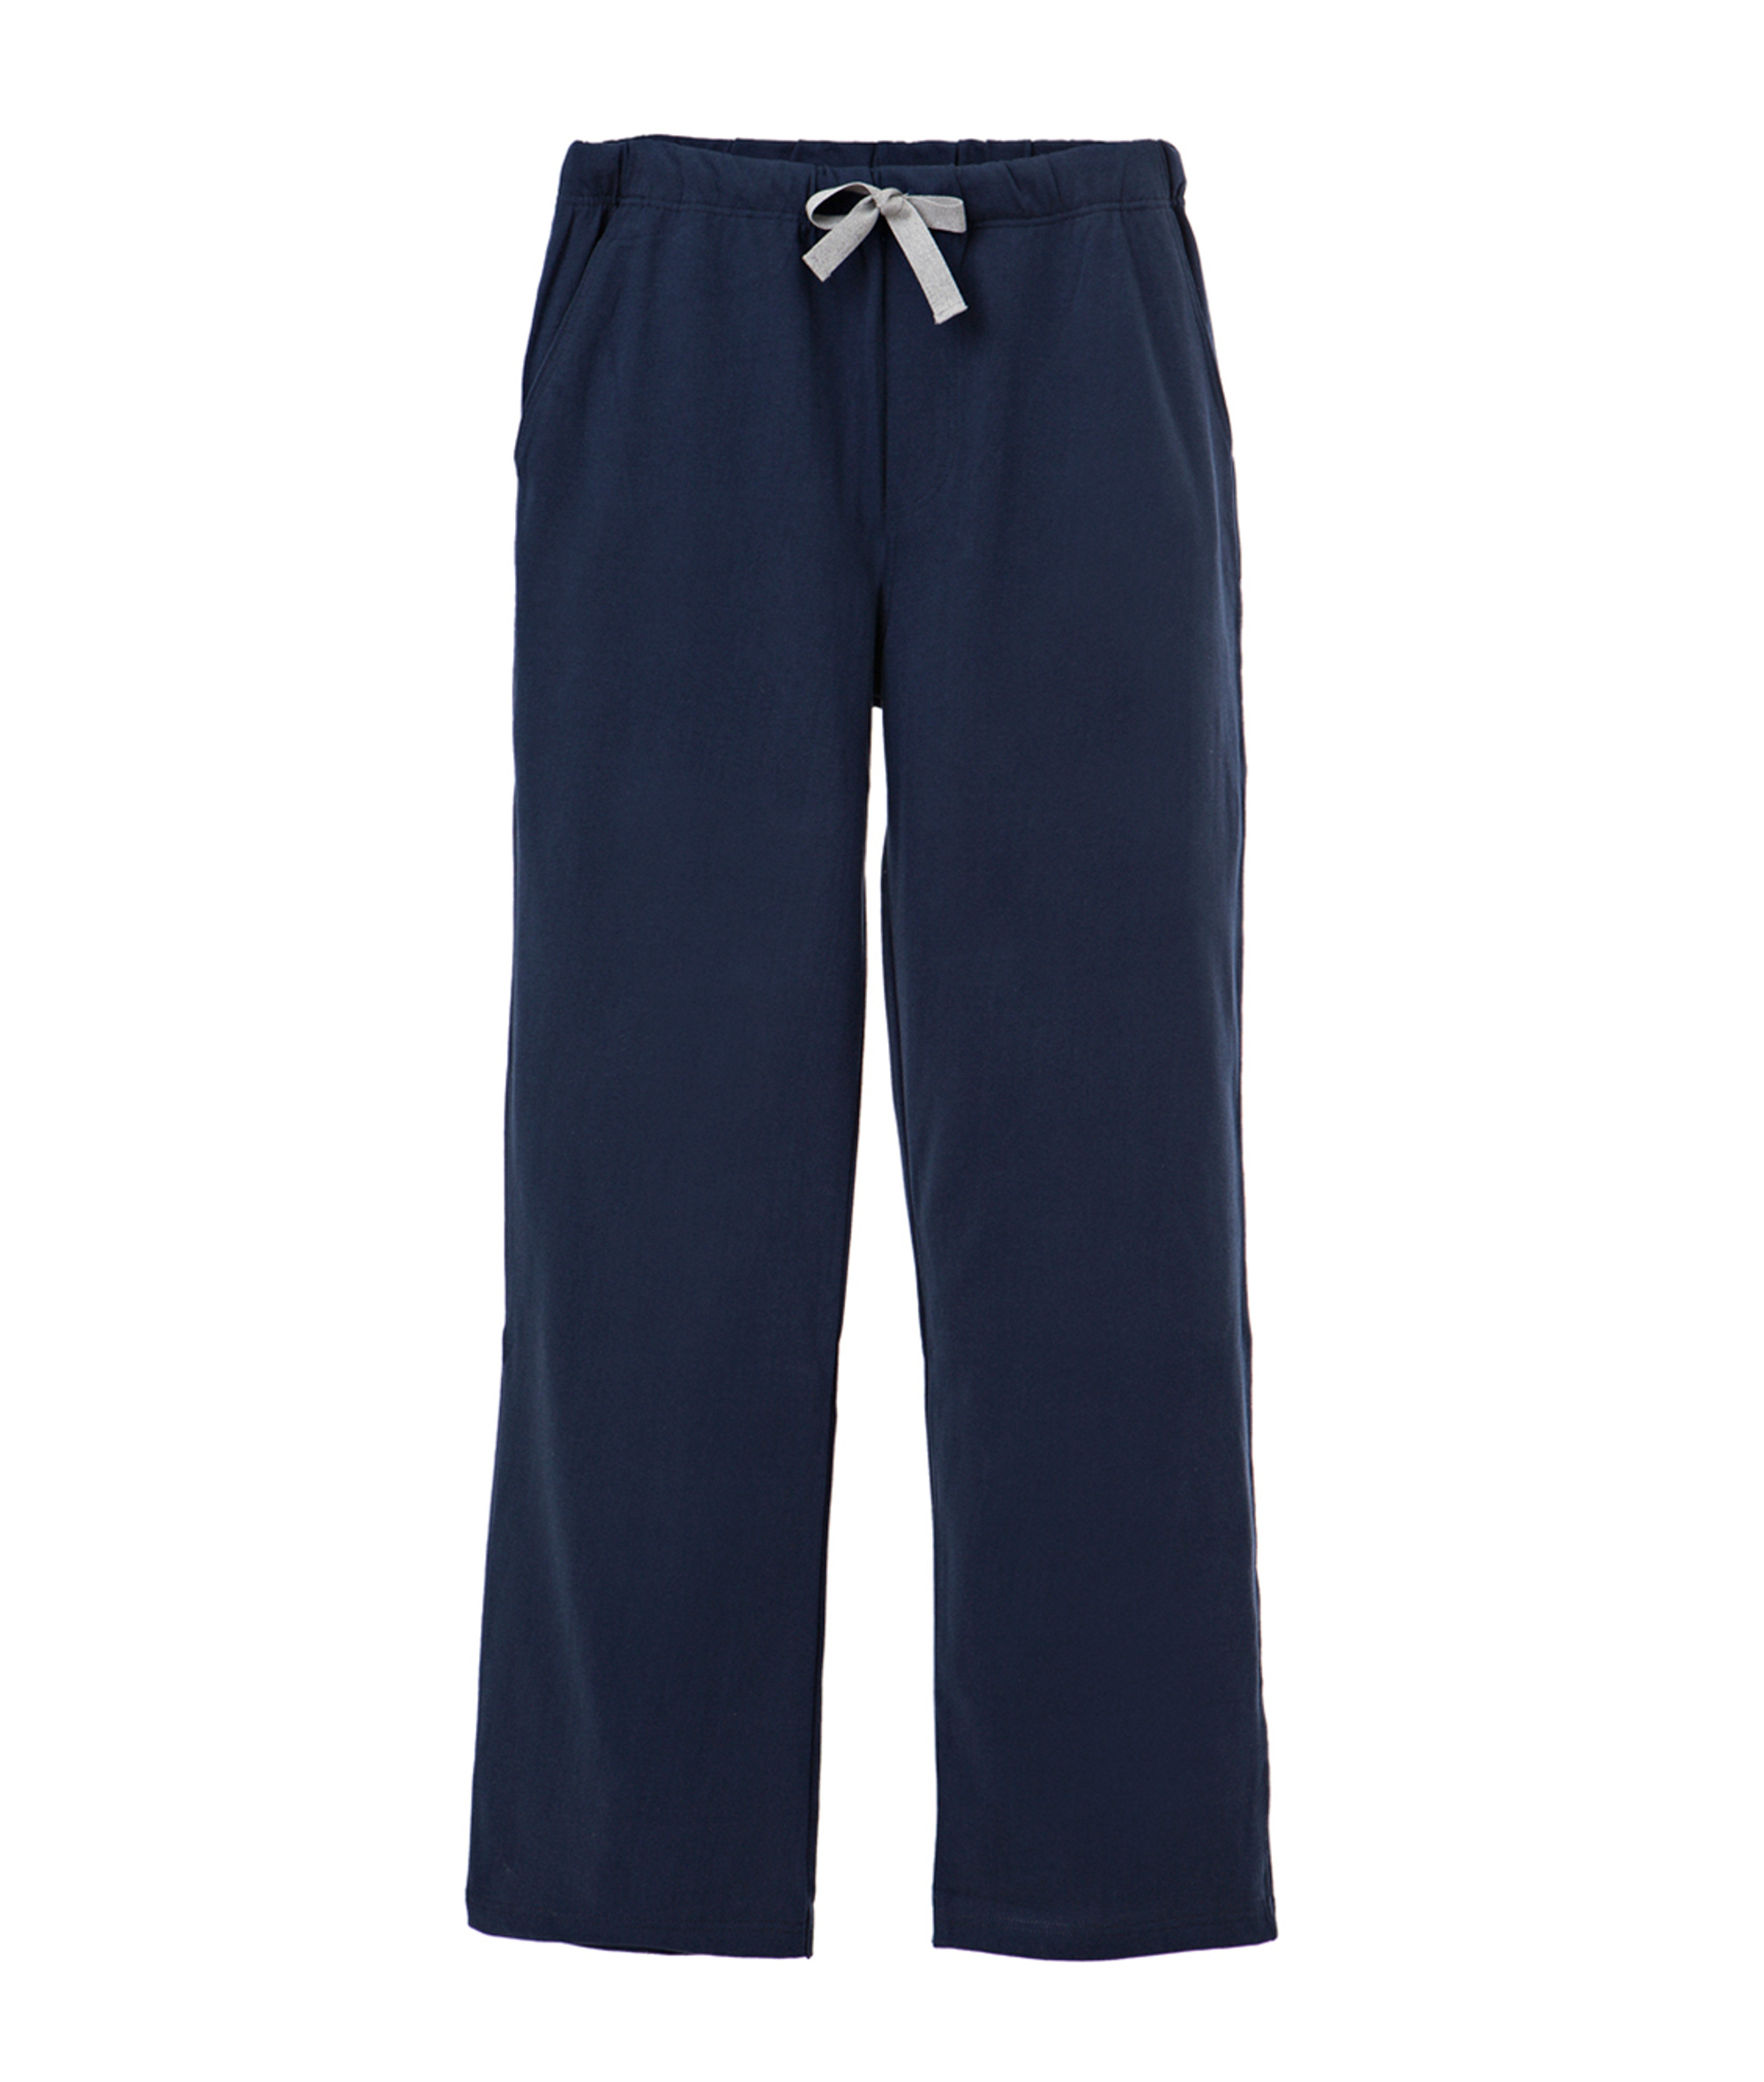 Robin Pajama, Gray/Blue